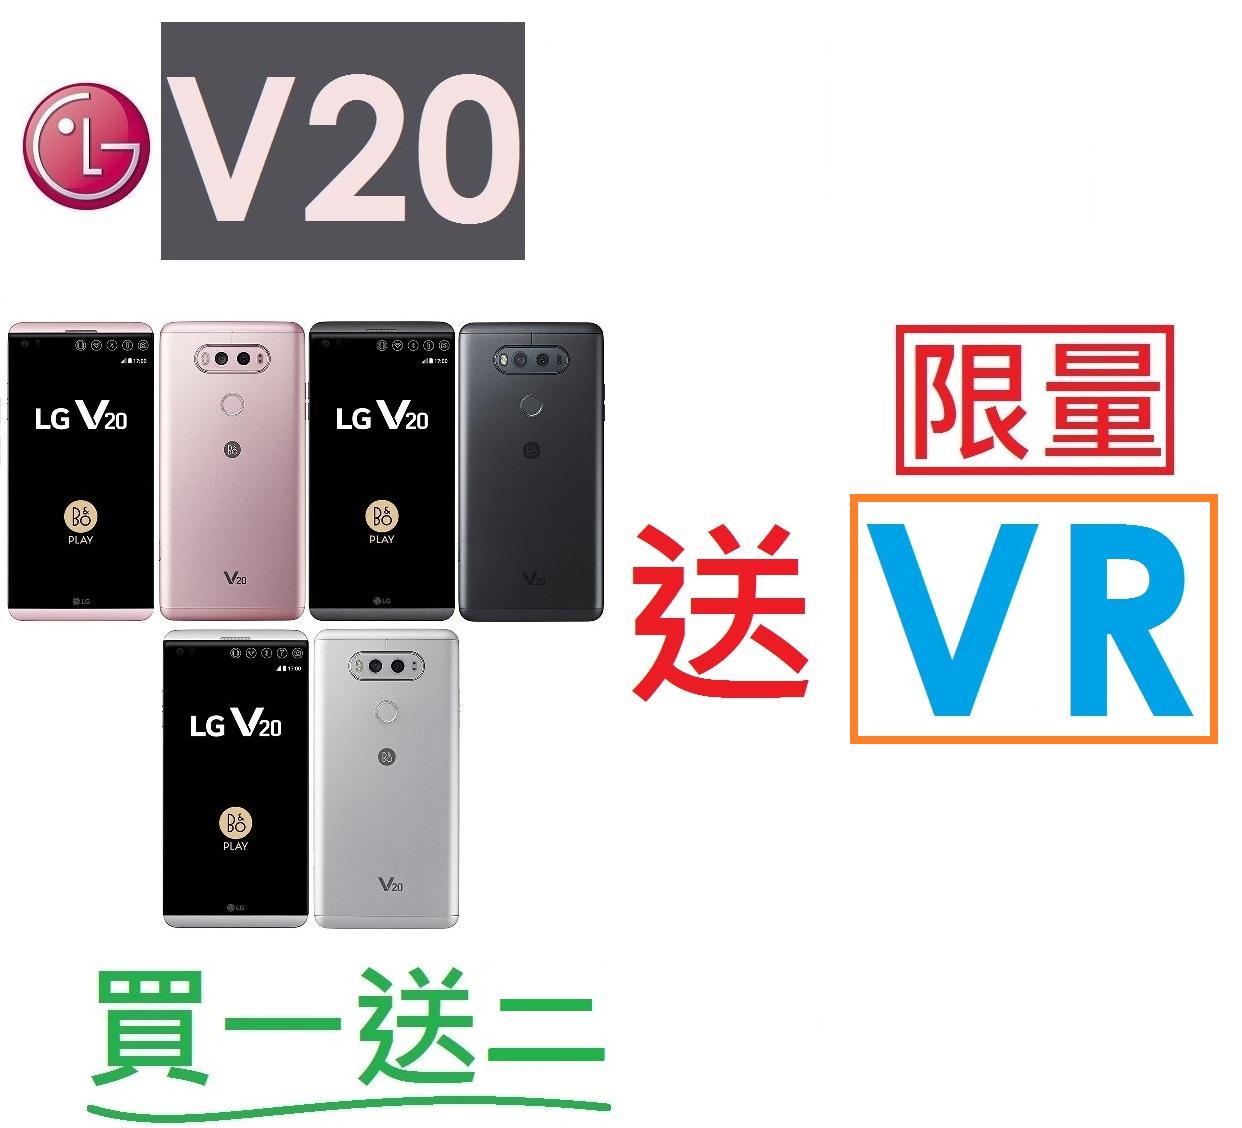 【現貨+預訂】樂金 LG V20 (H990)5.7吋 4G/64G 4G LTE 智慧型手機●雙螢幕●B&O Hi Fi●QC 3.0快充●廣角(送VR眼鏡)